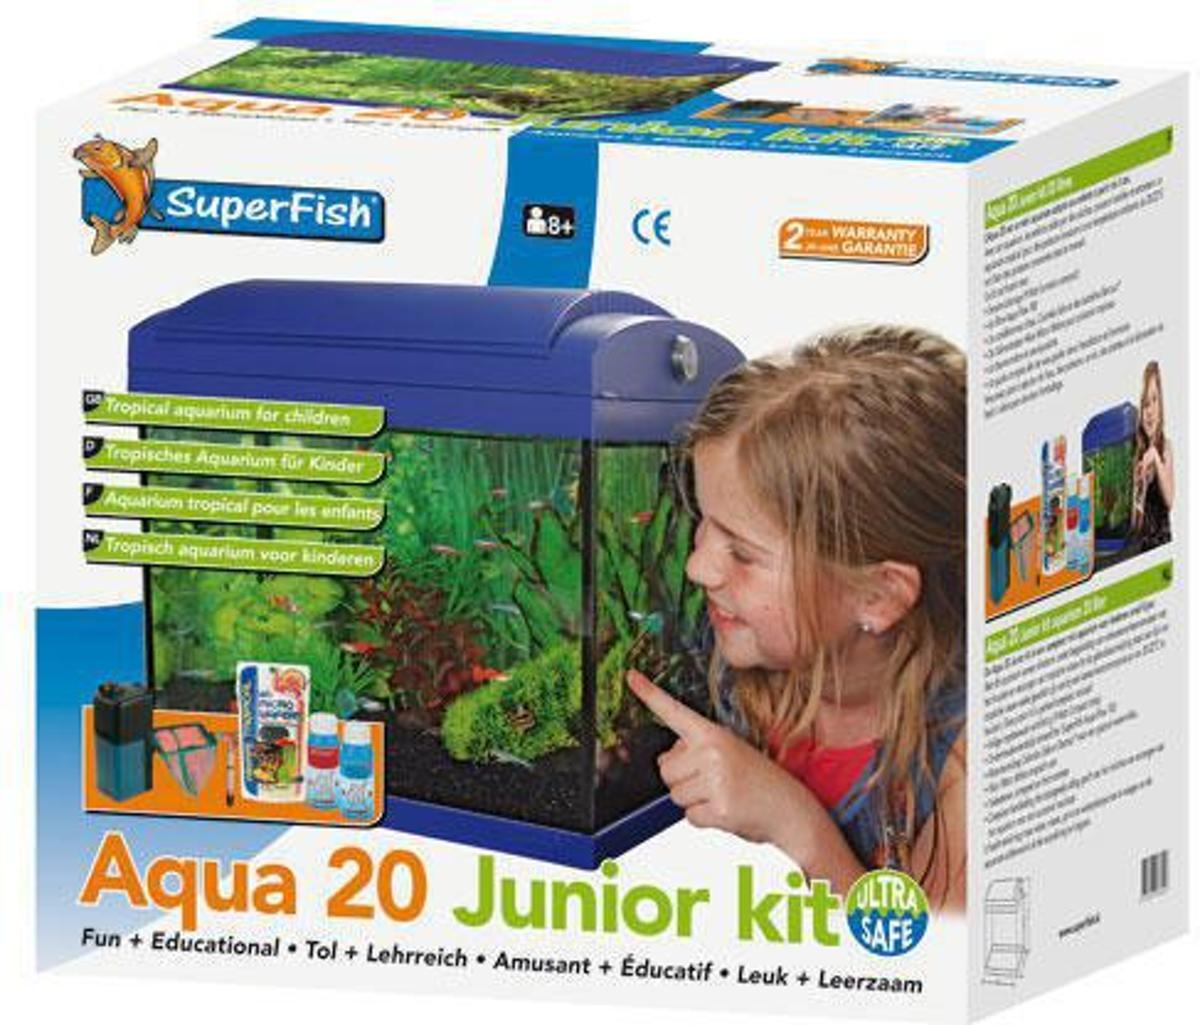 bol.com | Superfish Aqua - 20 Junior Kit